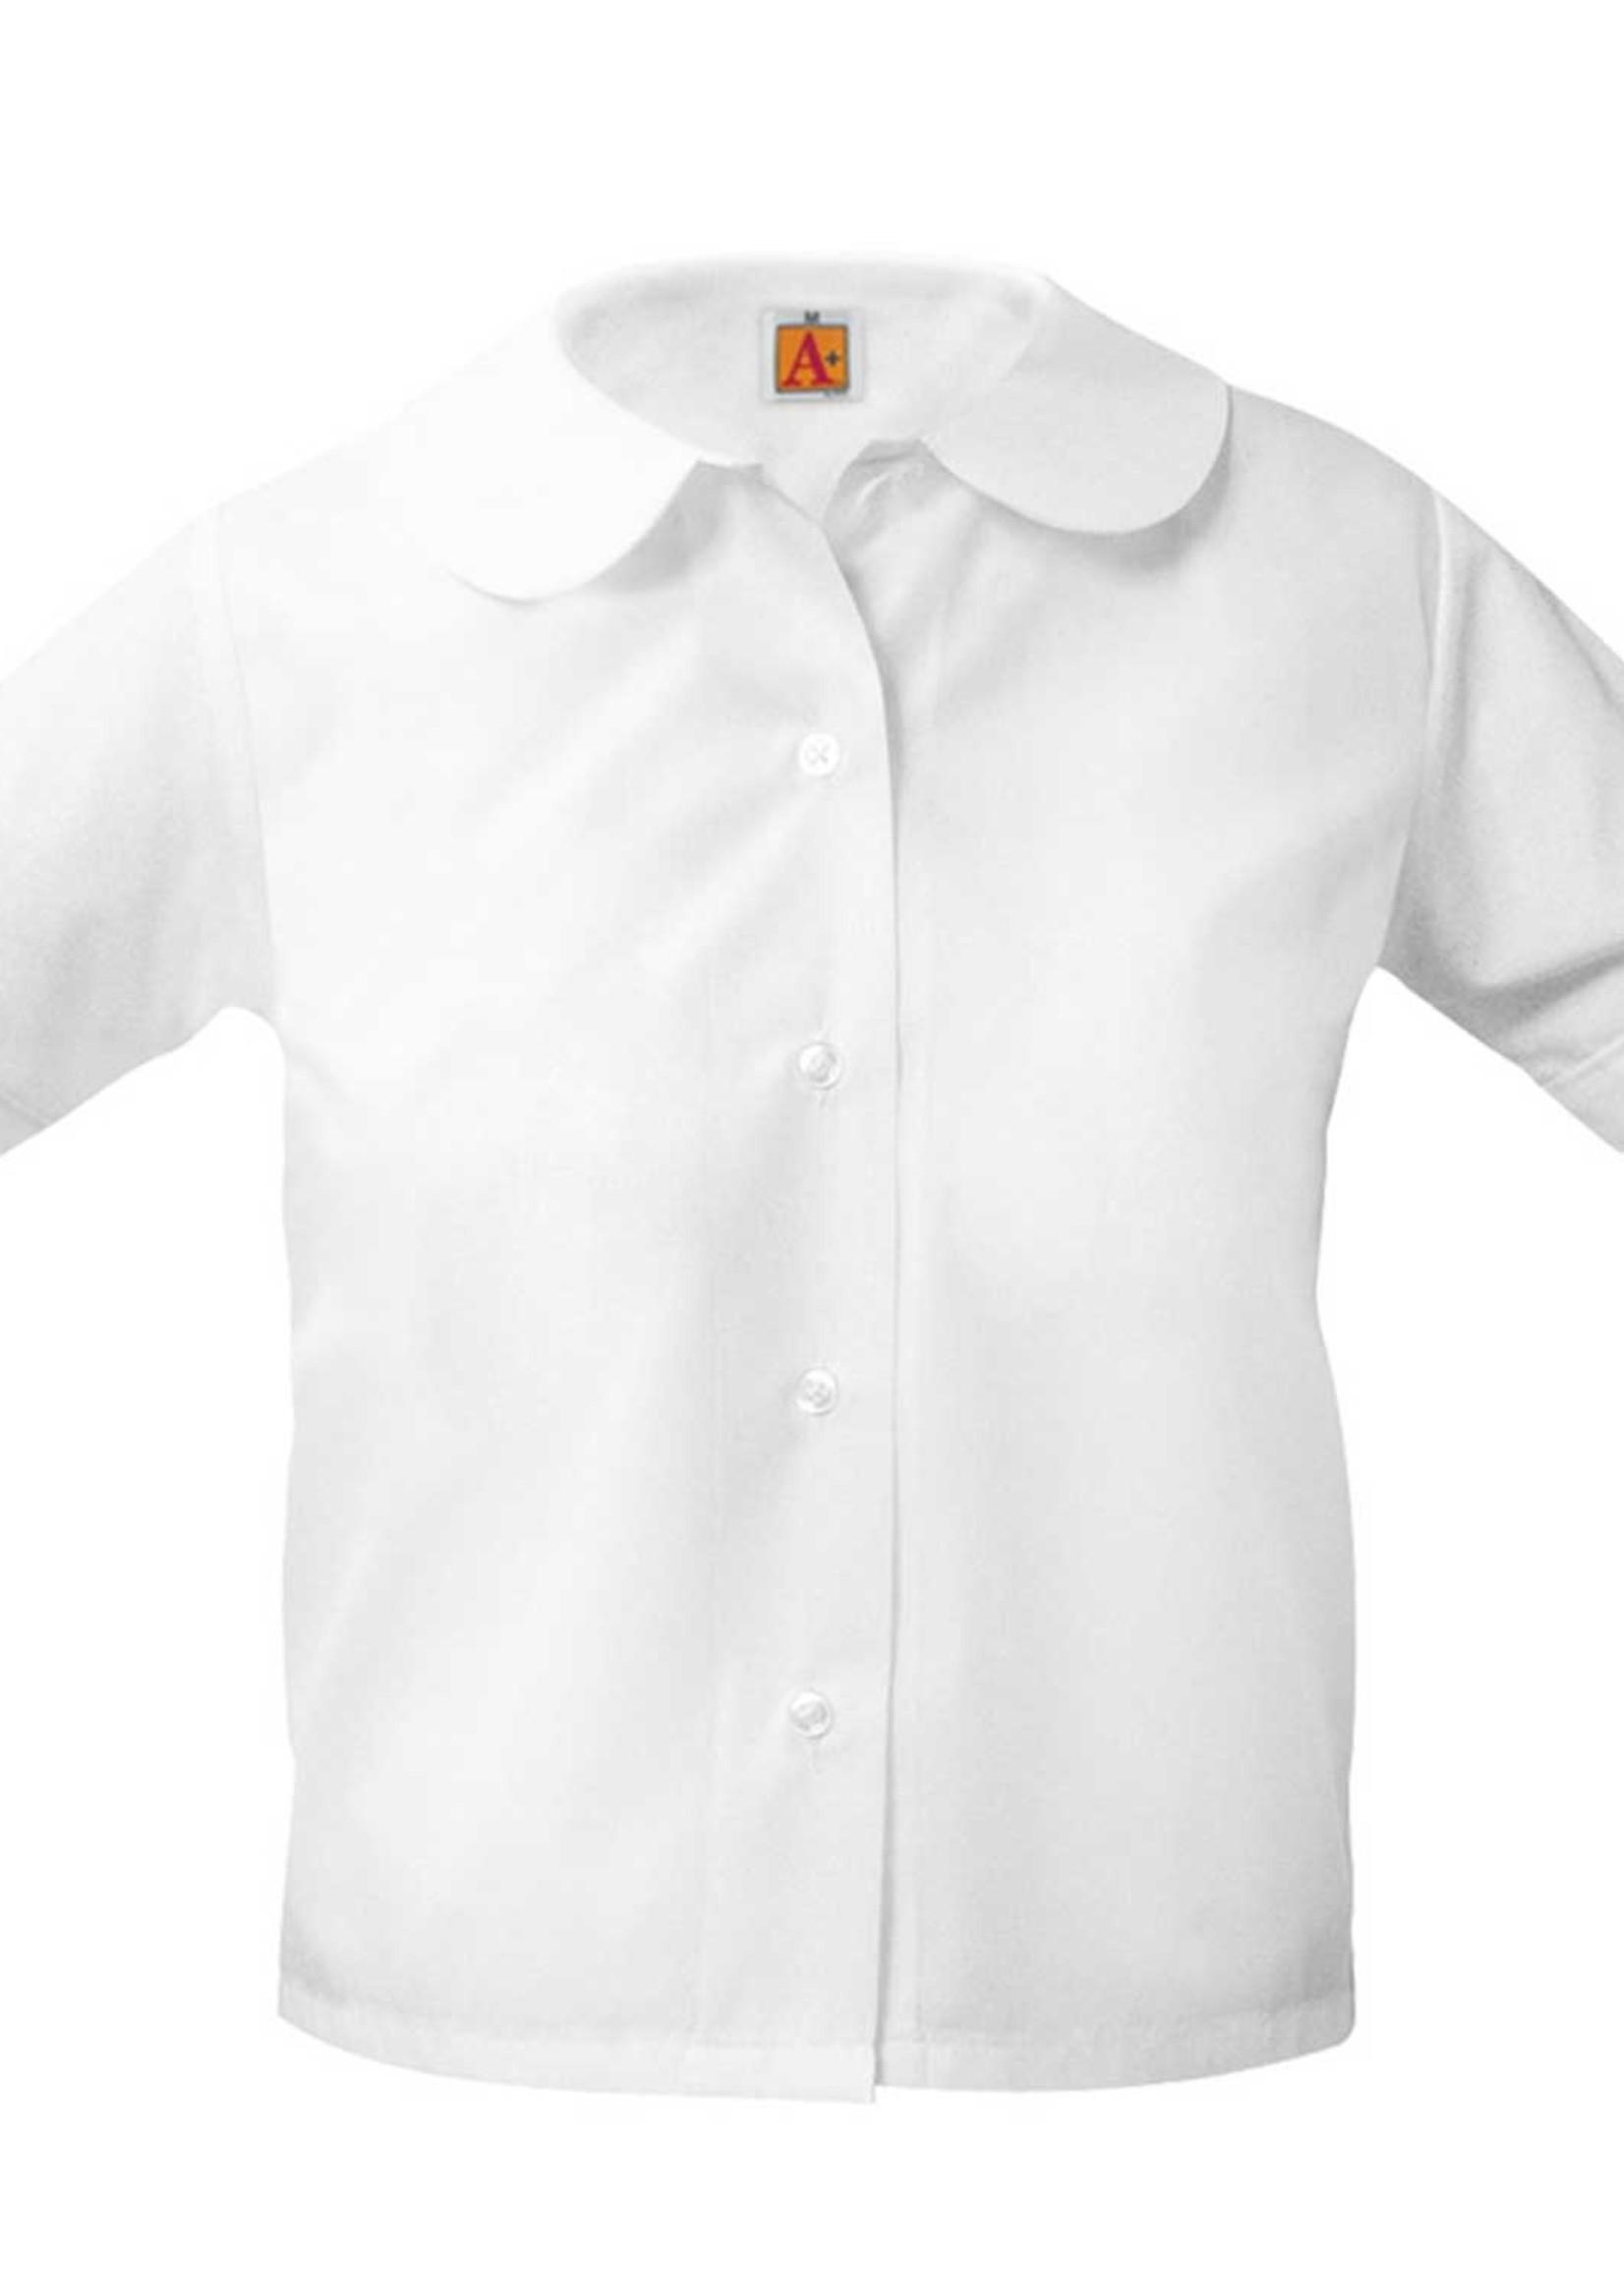 JDA White Short Sleeve Peter Pan Blouse w/o Pocket (Jumper Only)